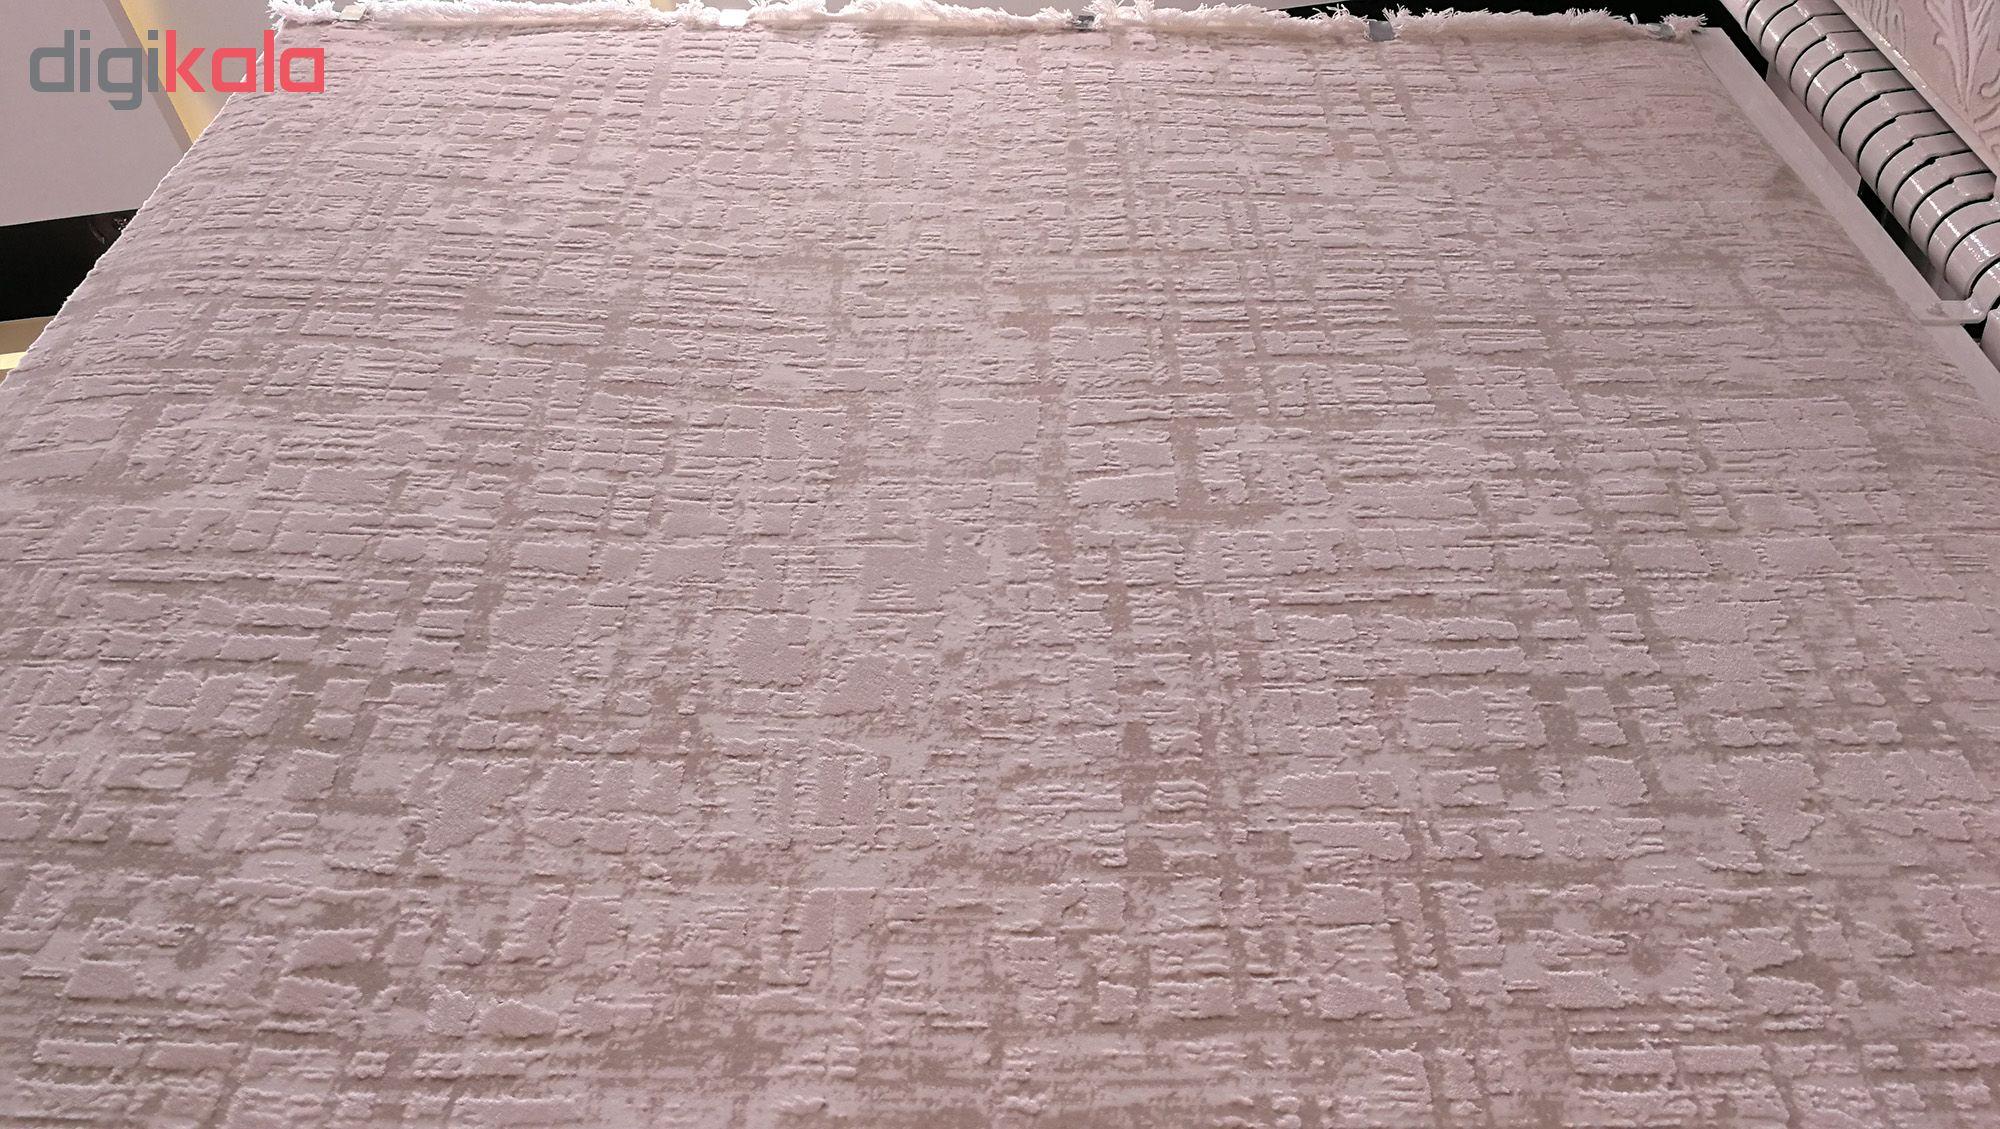 فرش ماشینی زمرد مشهد کد 2116 زمینه کرم